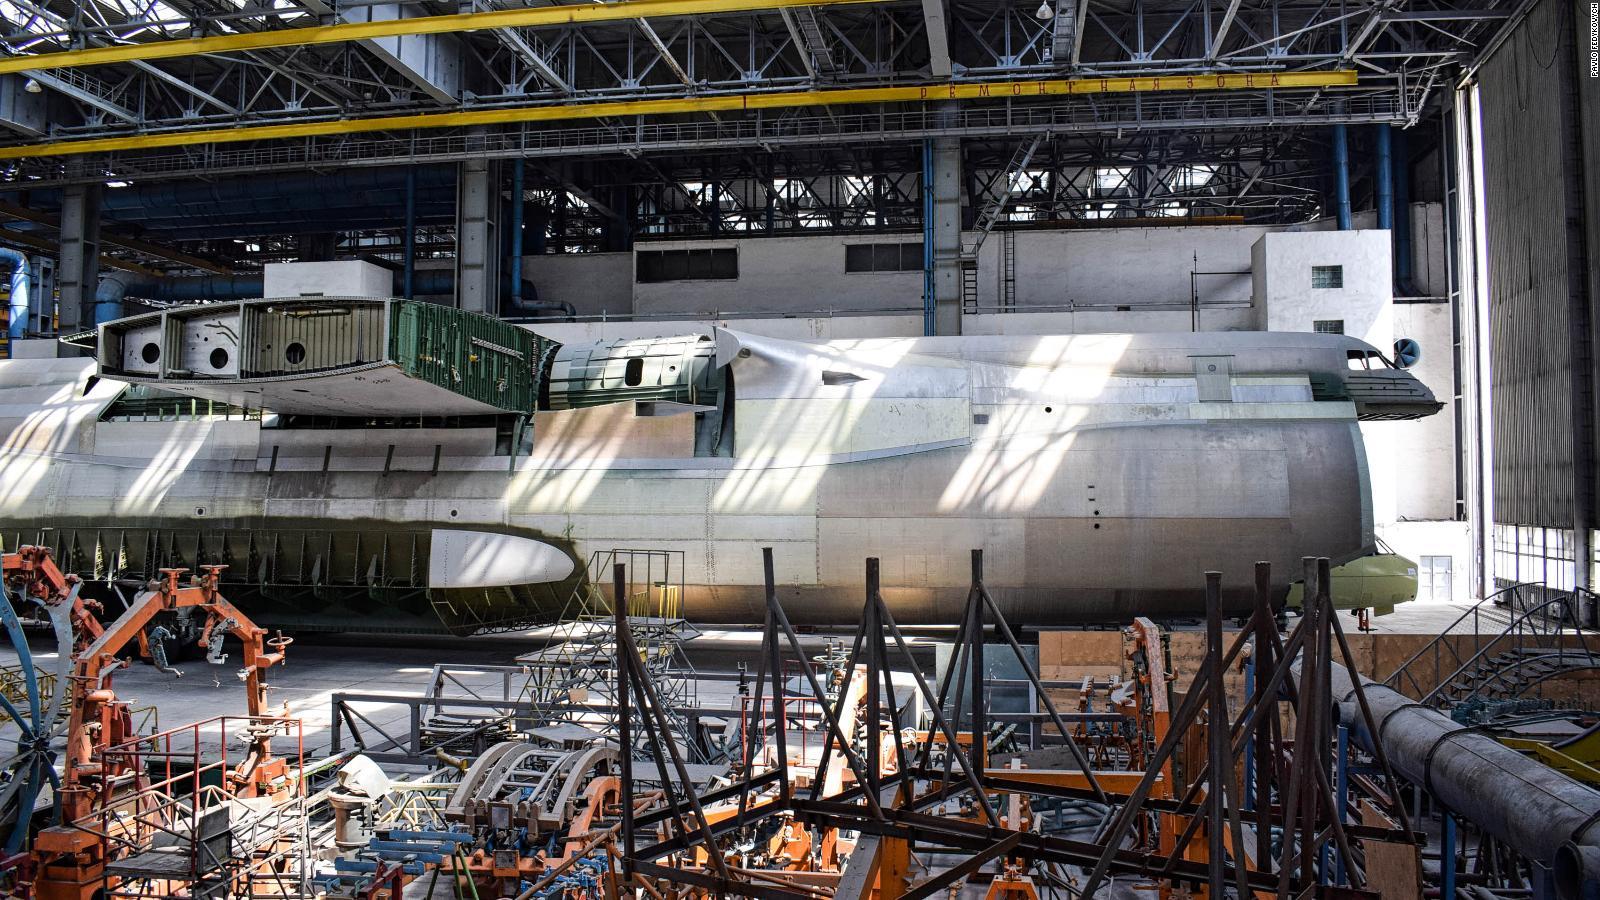 Antonov An-225: Enormous, unfinished plane lies hidden in hangar   CNN Travel